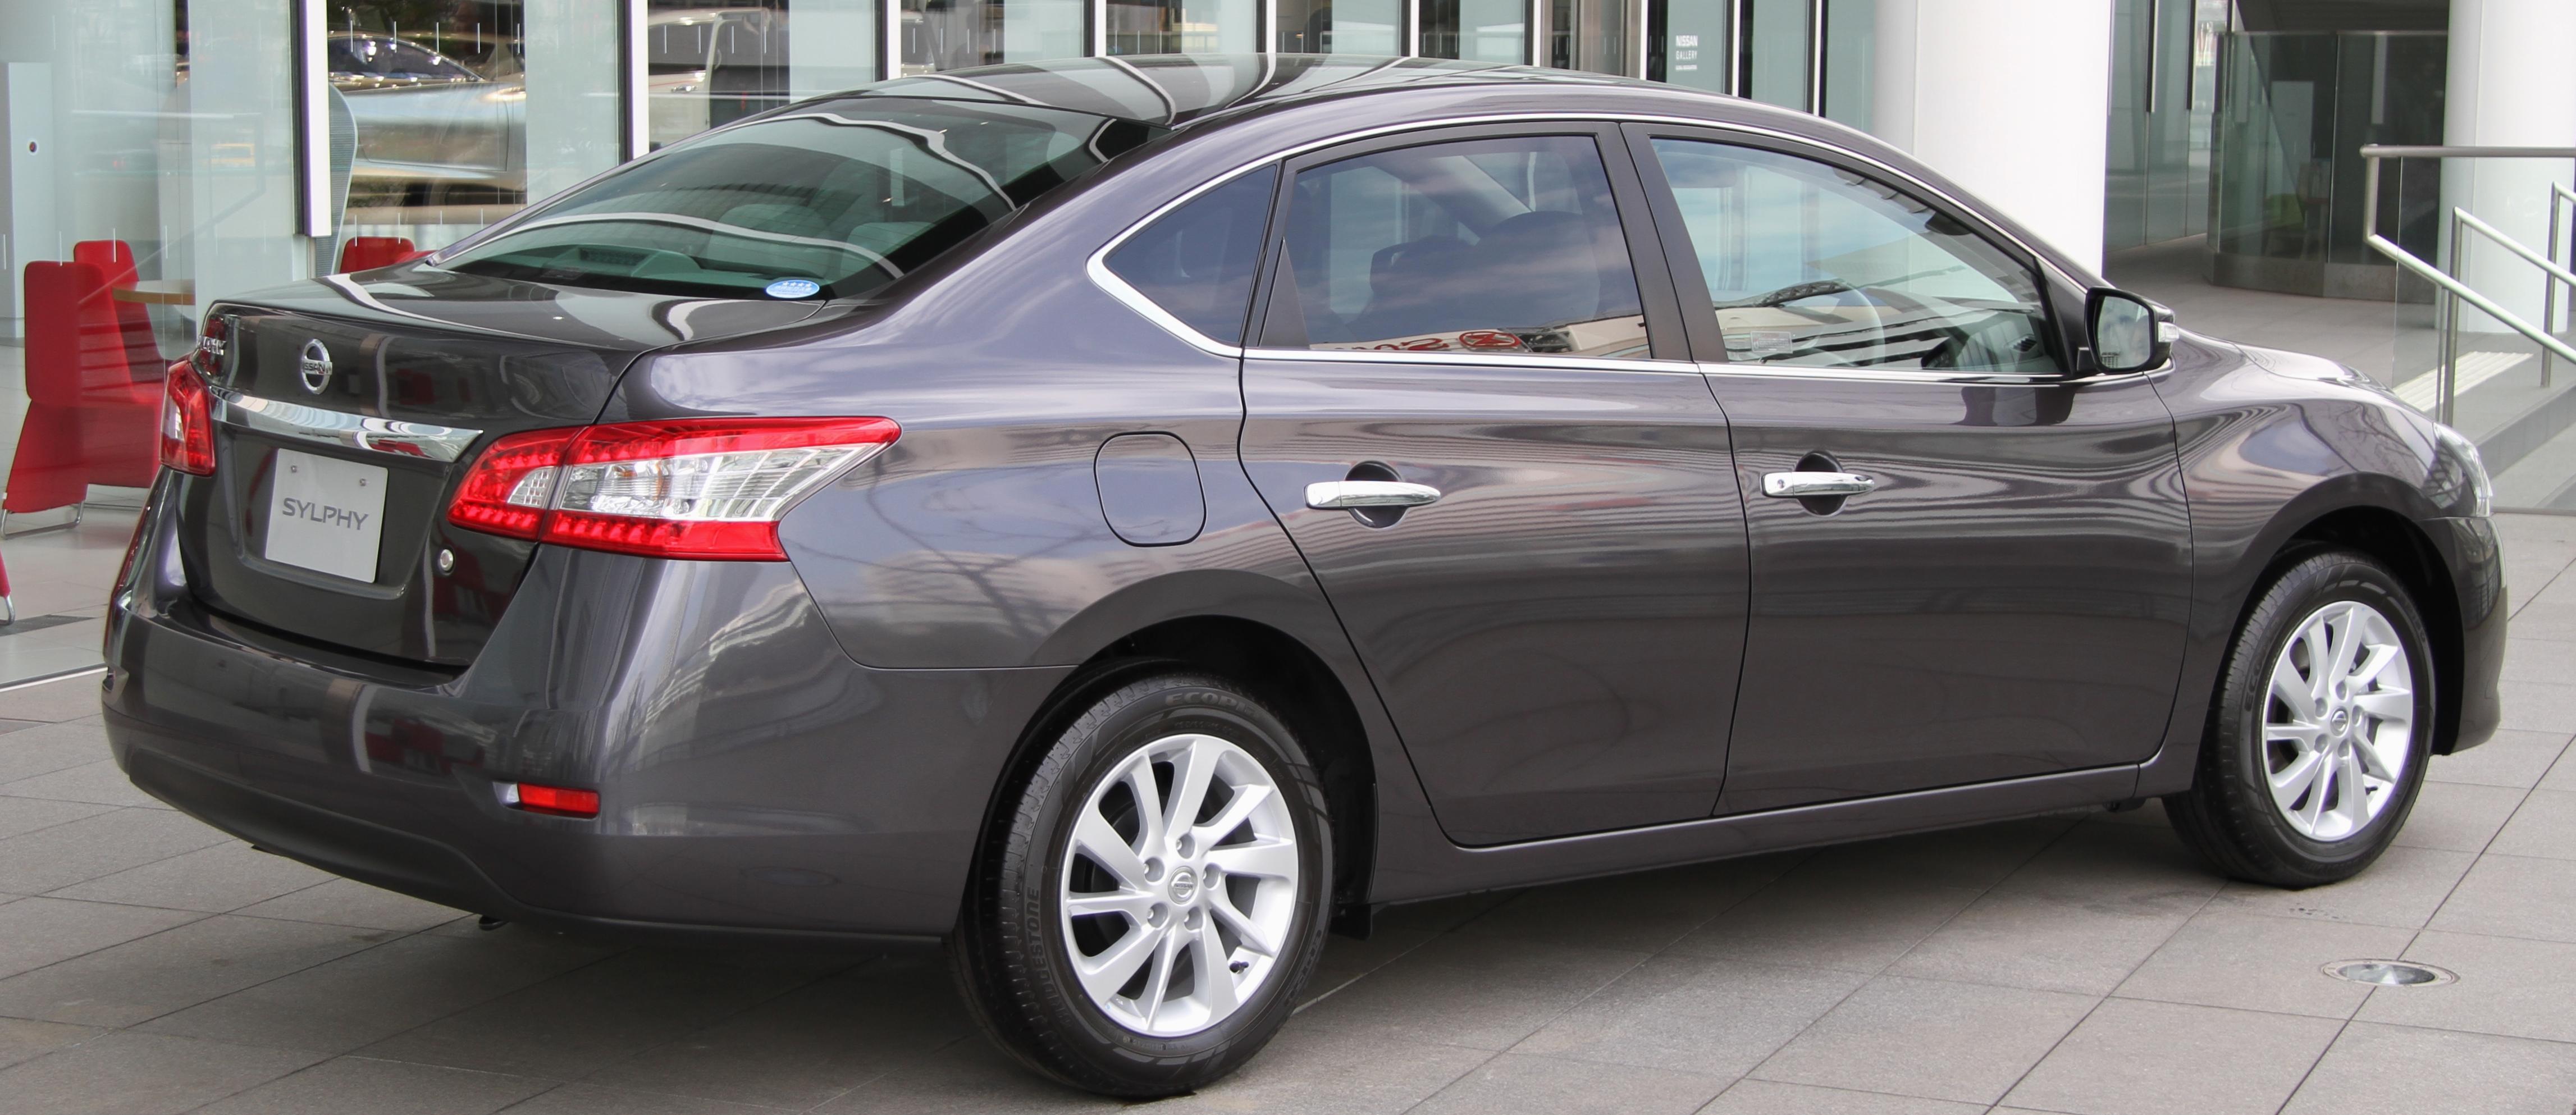 File:Nissan Sylphy B17 G rear.jpg - Wikimedia Commons